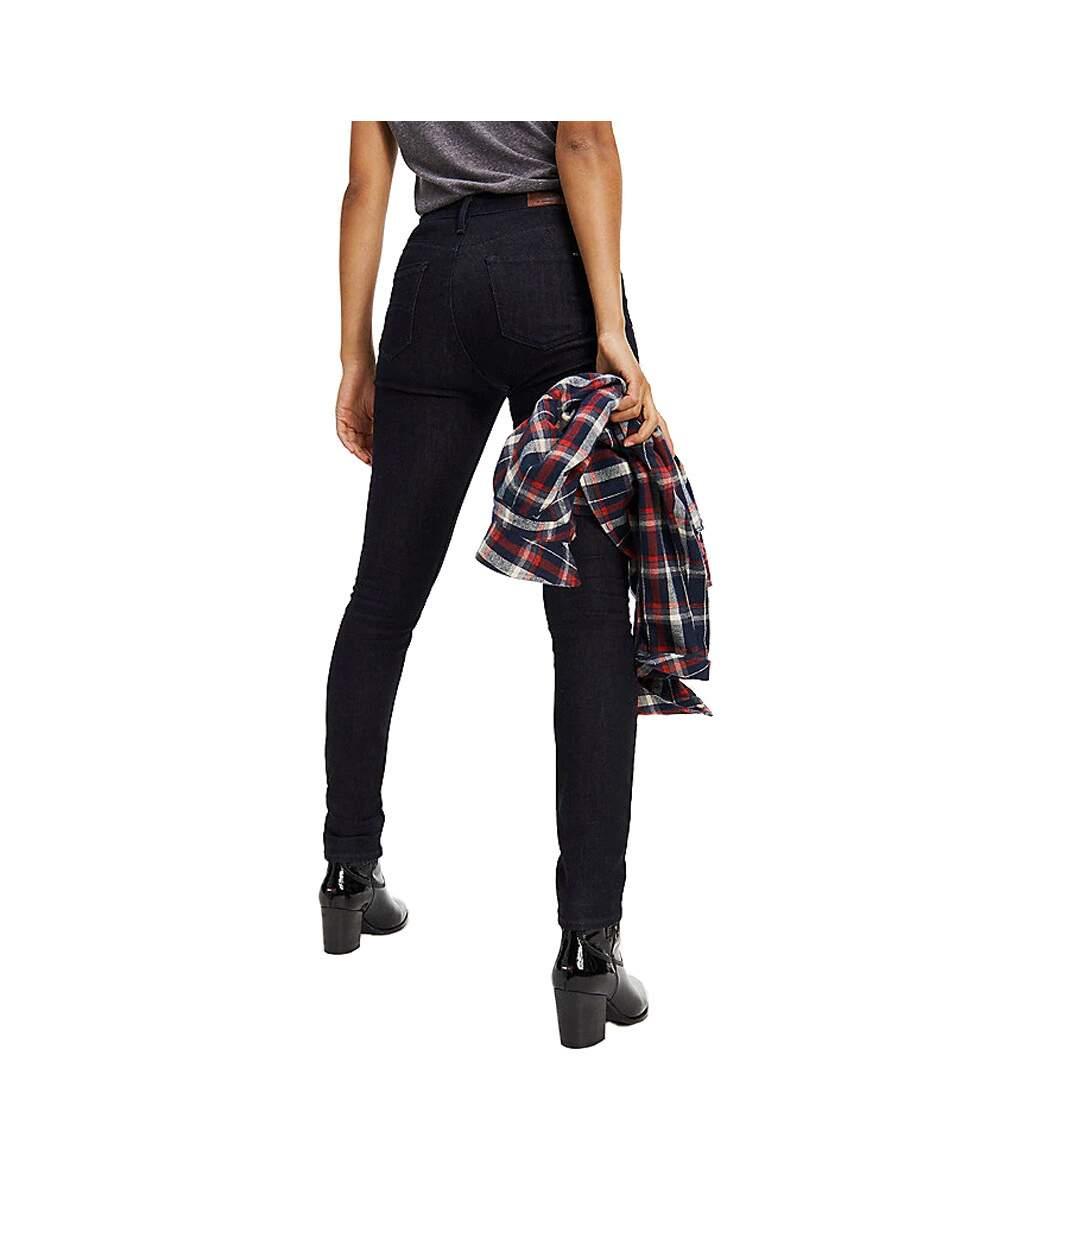 Jeans Taille Haute Skinny Marine Femme Tommy Hilfiger SAN